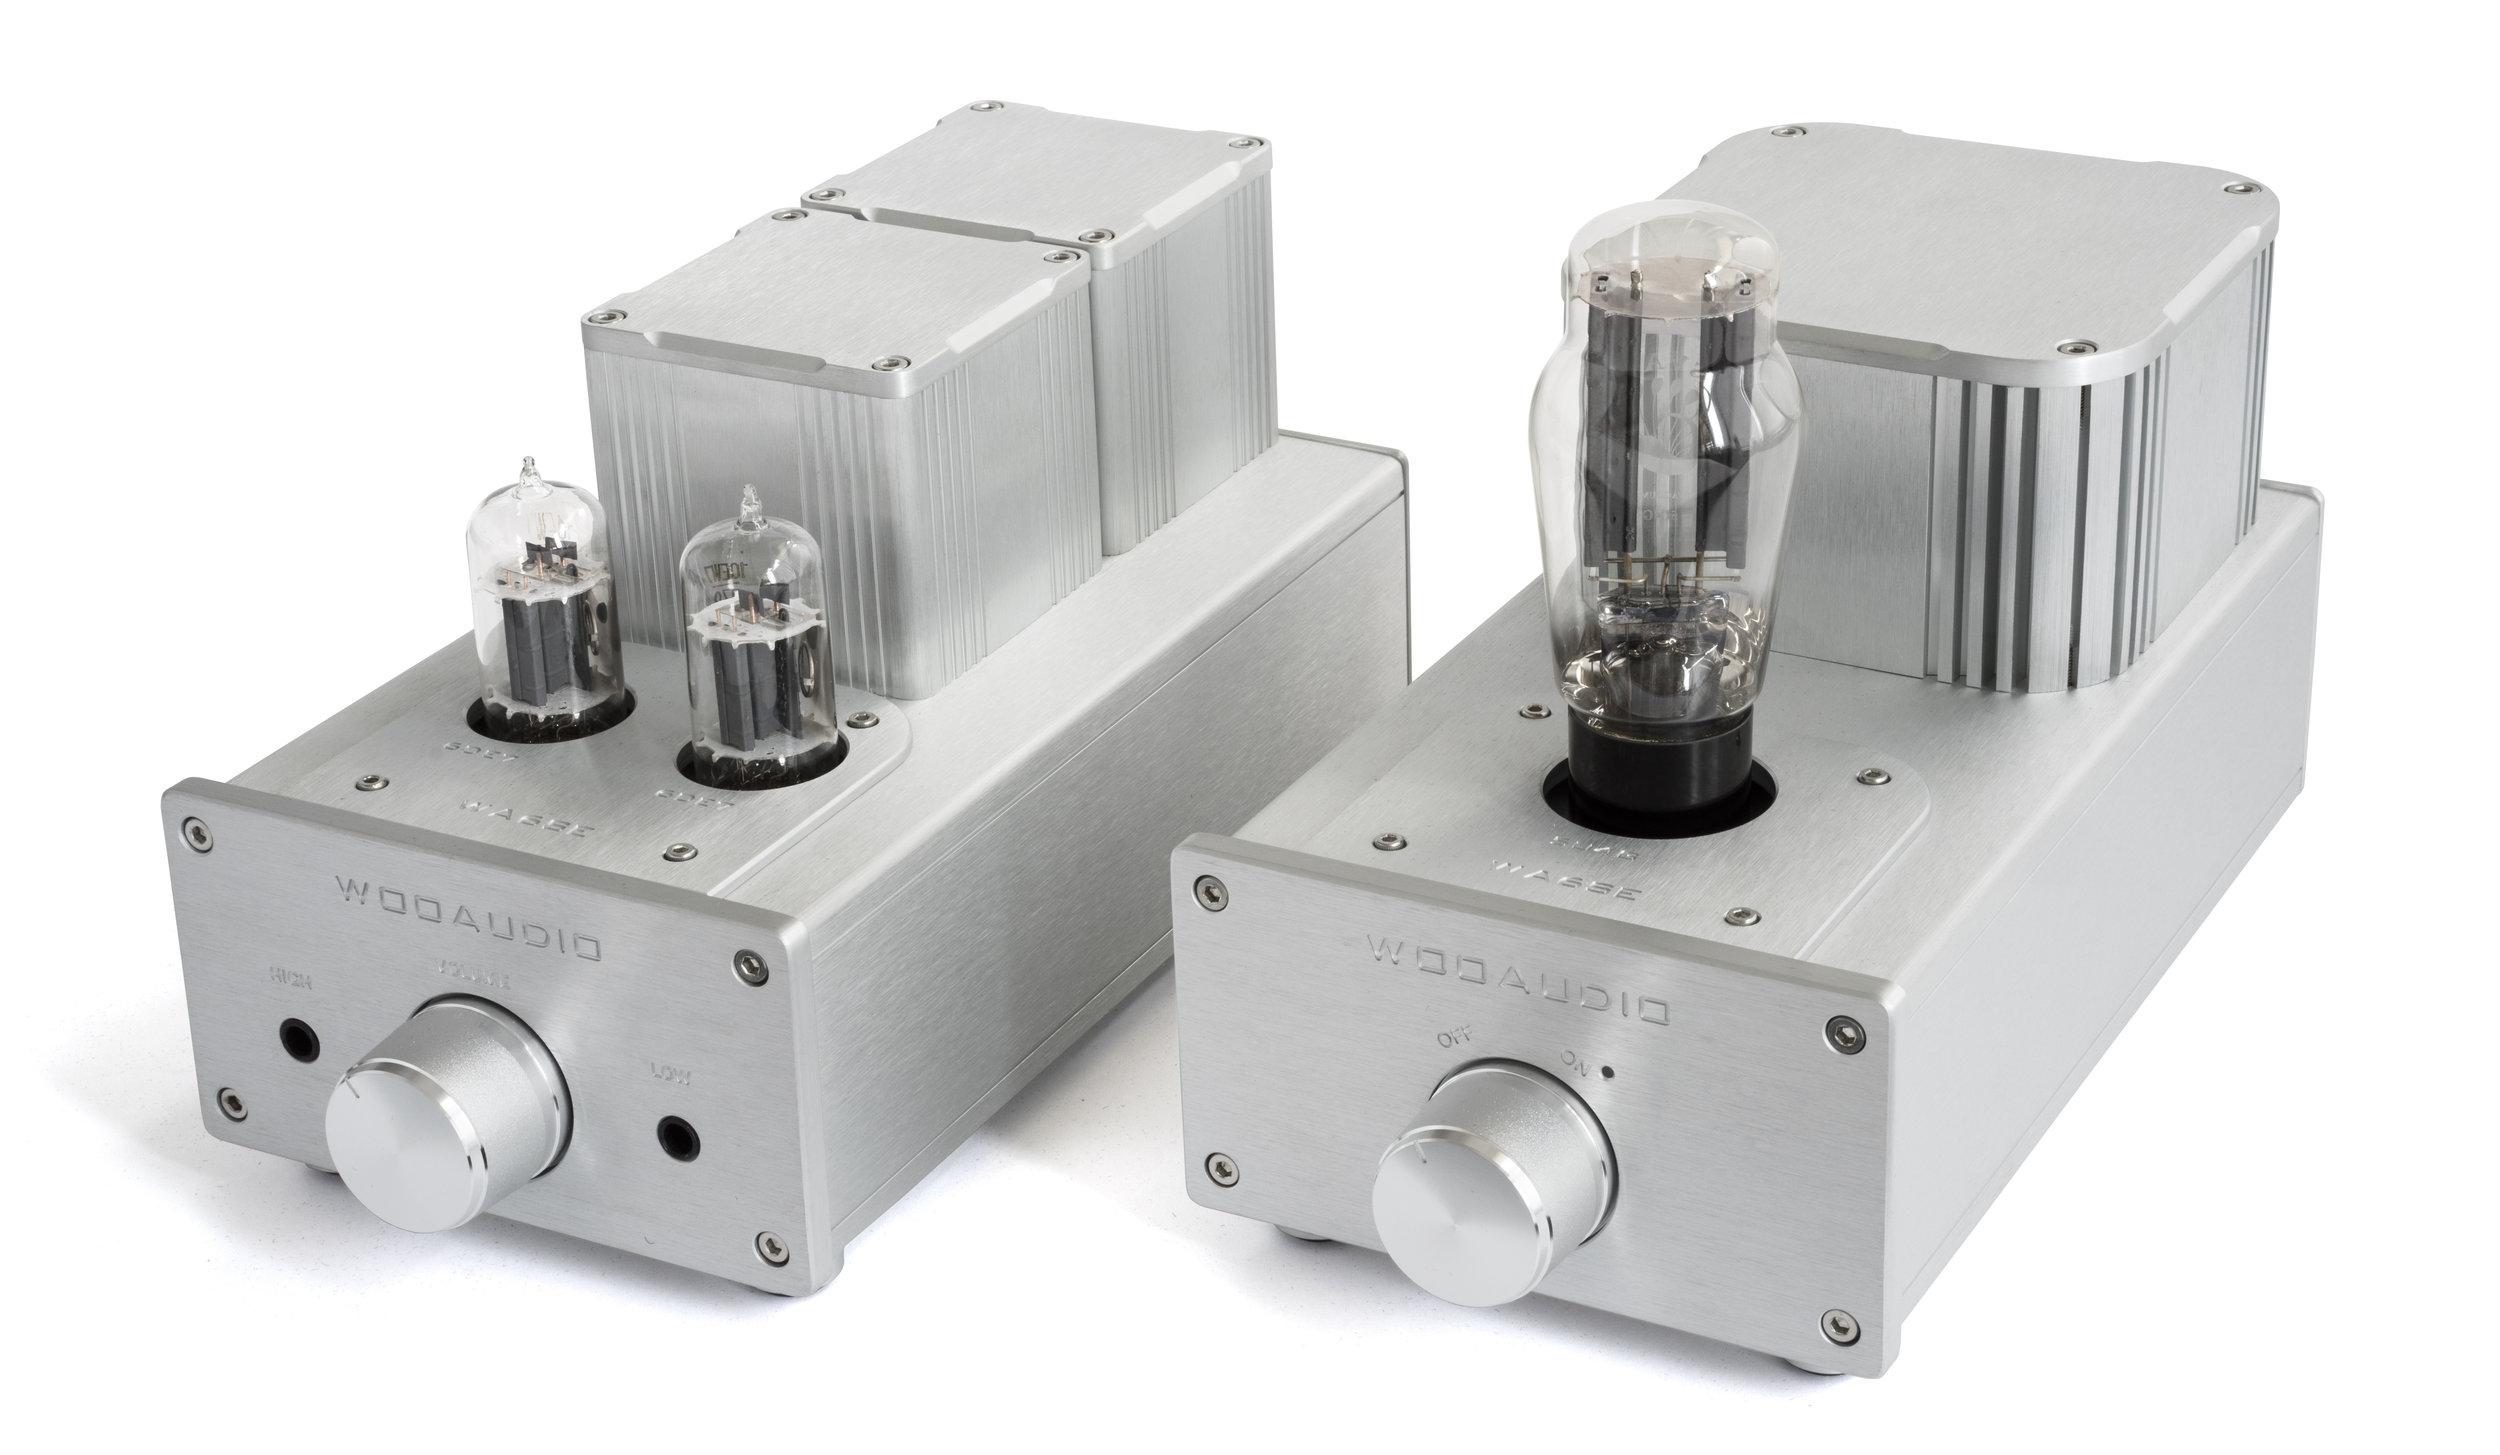 woo-audio-wa6se-silver-headphone-amplifier-highend-audiophile-vacuum-tube-headfi-274b-6de7-tubes-preamplifier